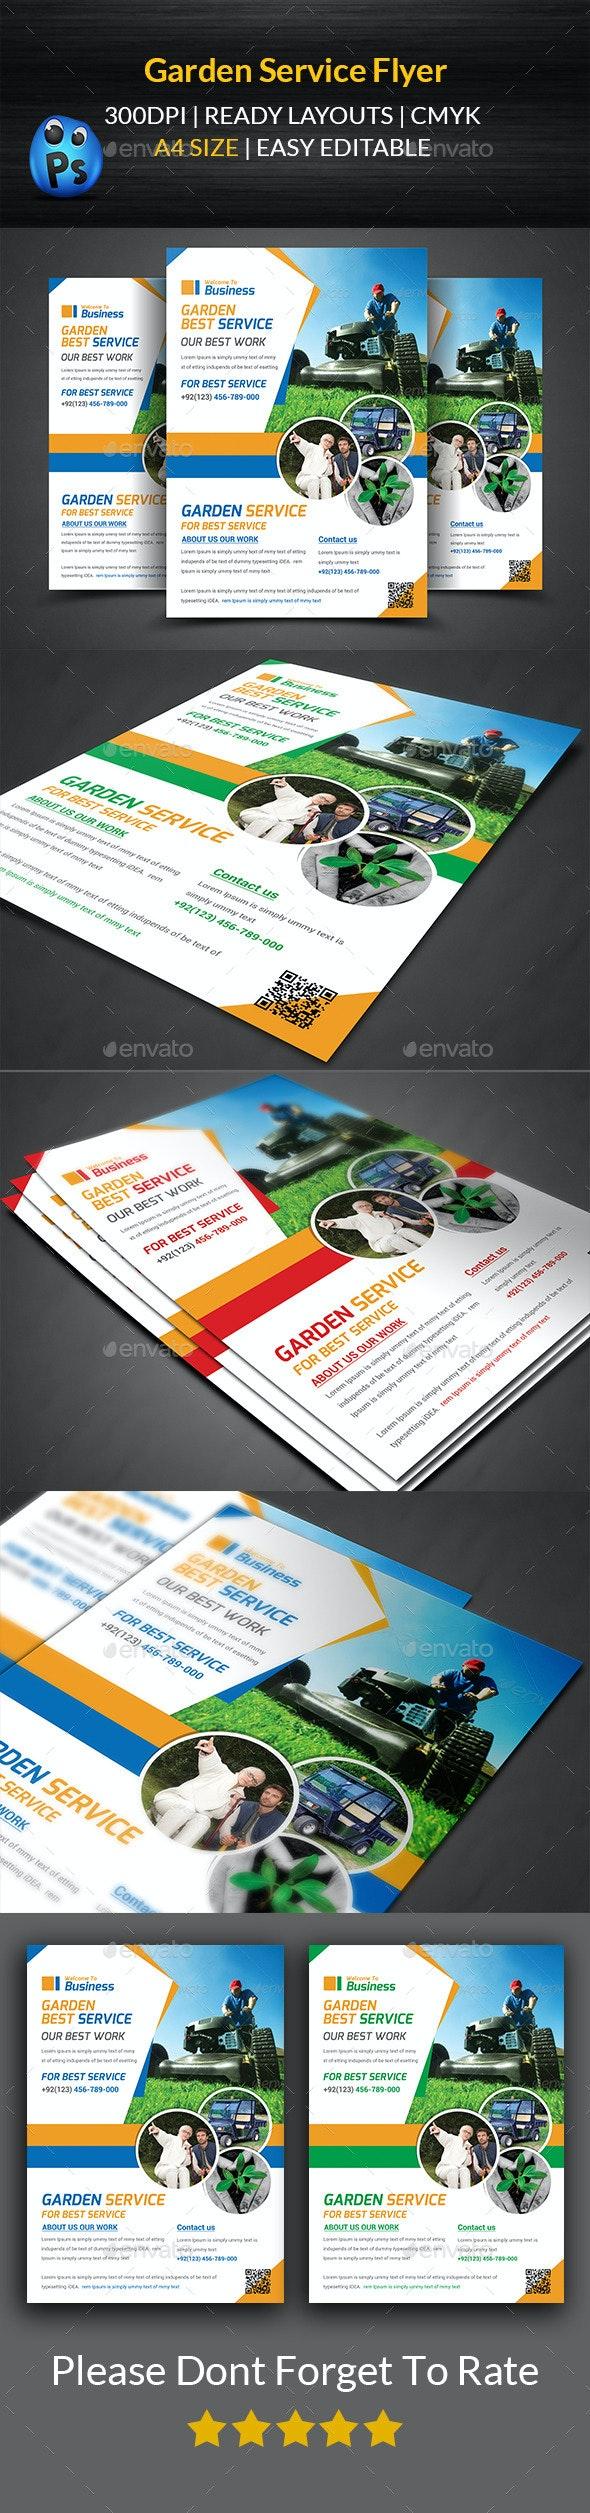 Garden Services Flyer Template  - Corporate Flyers